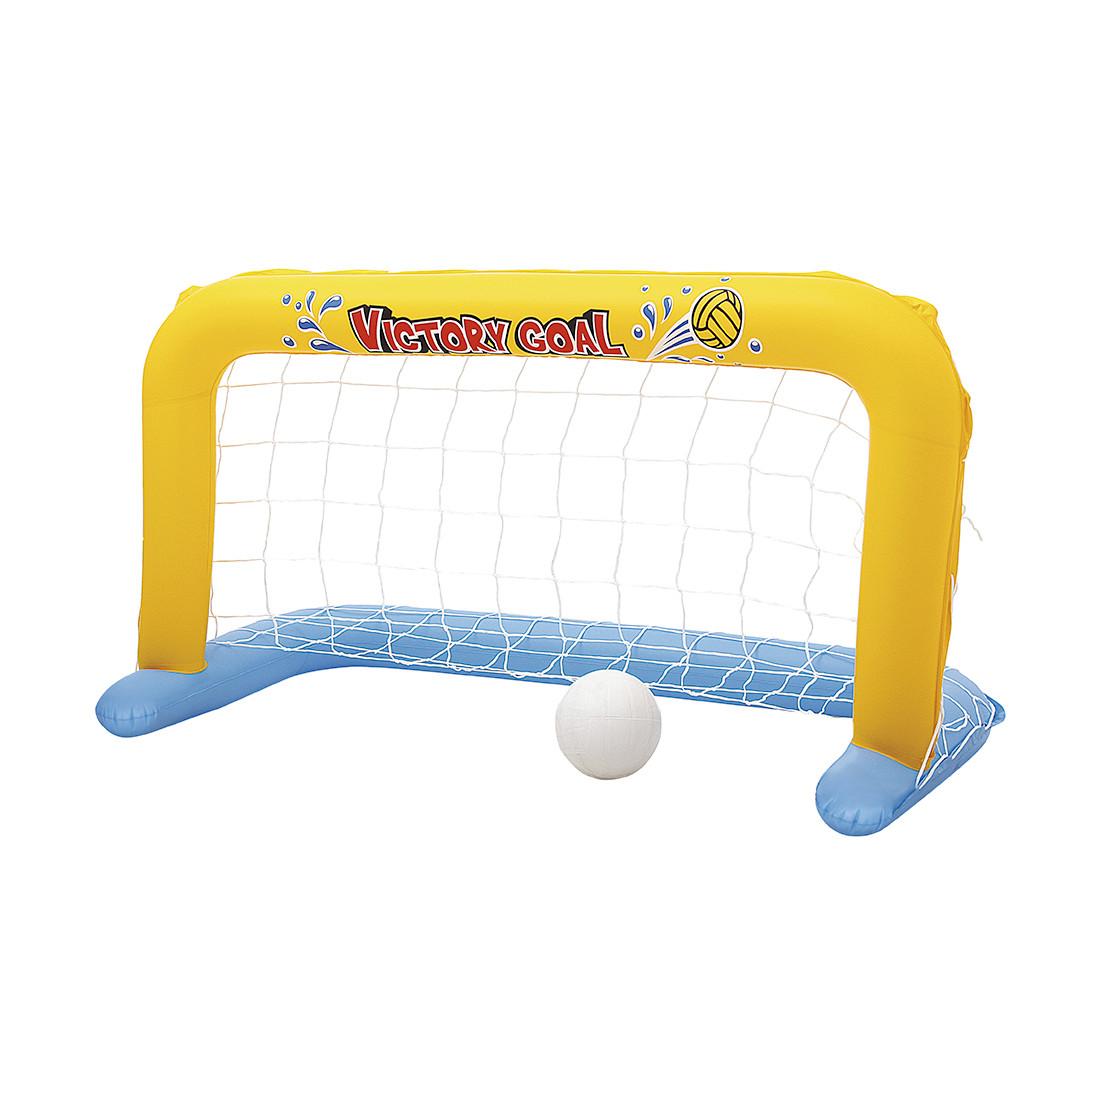 Надувной игровой центр Water Polo Frame 137 х 66 см, BESTWAY, 52123